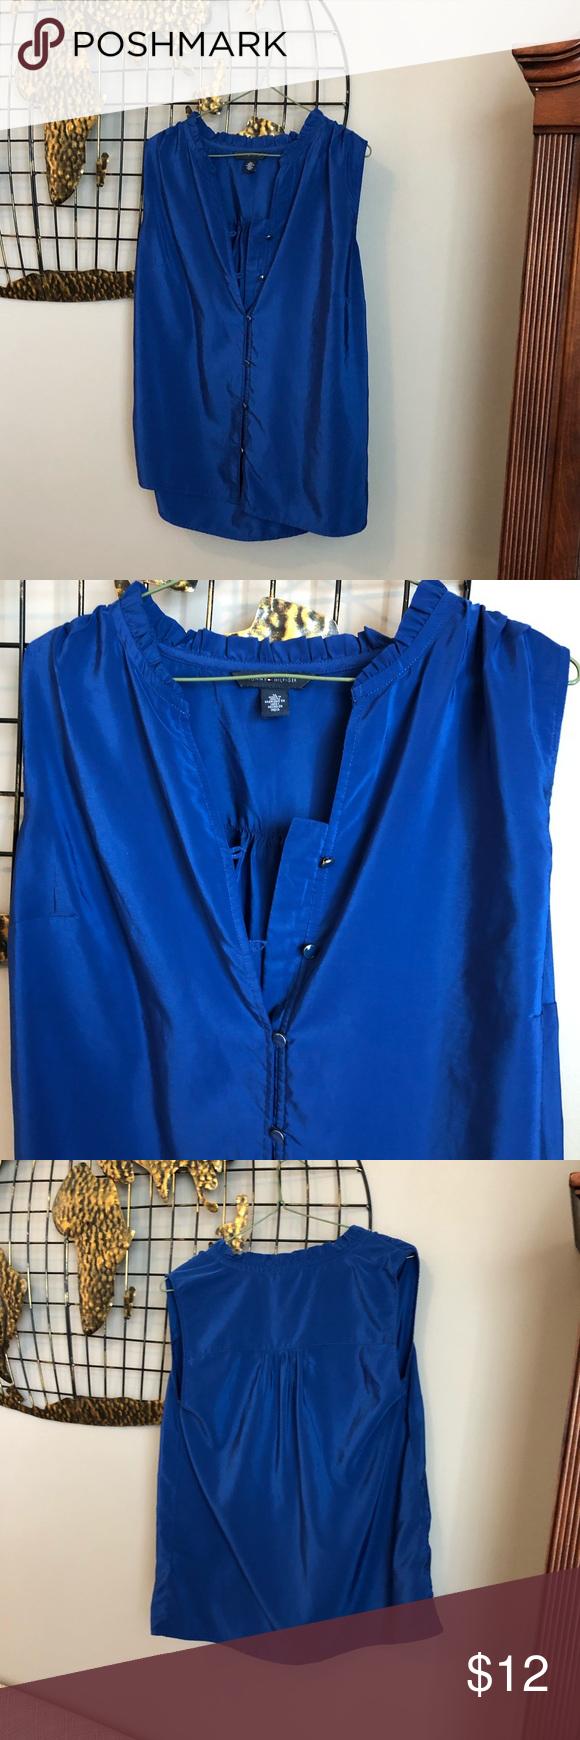 Button Down Tommy Hil Shirt Clothes Design Black Striped Shirt Perfect Little Black Dress [ 1740 x 580 Pixel ]